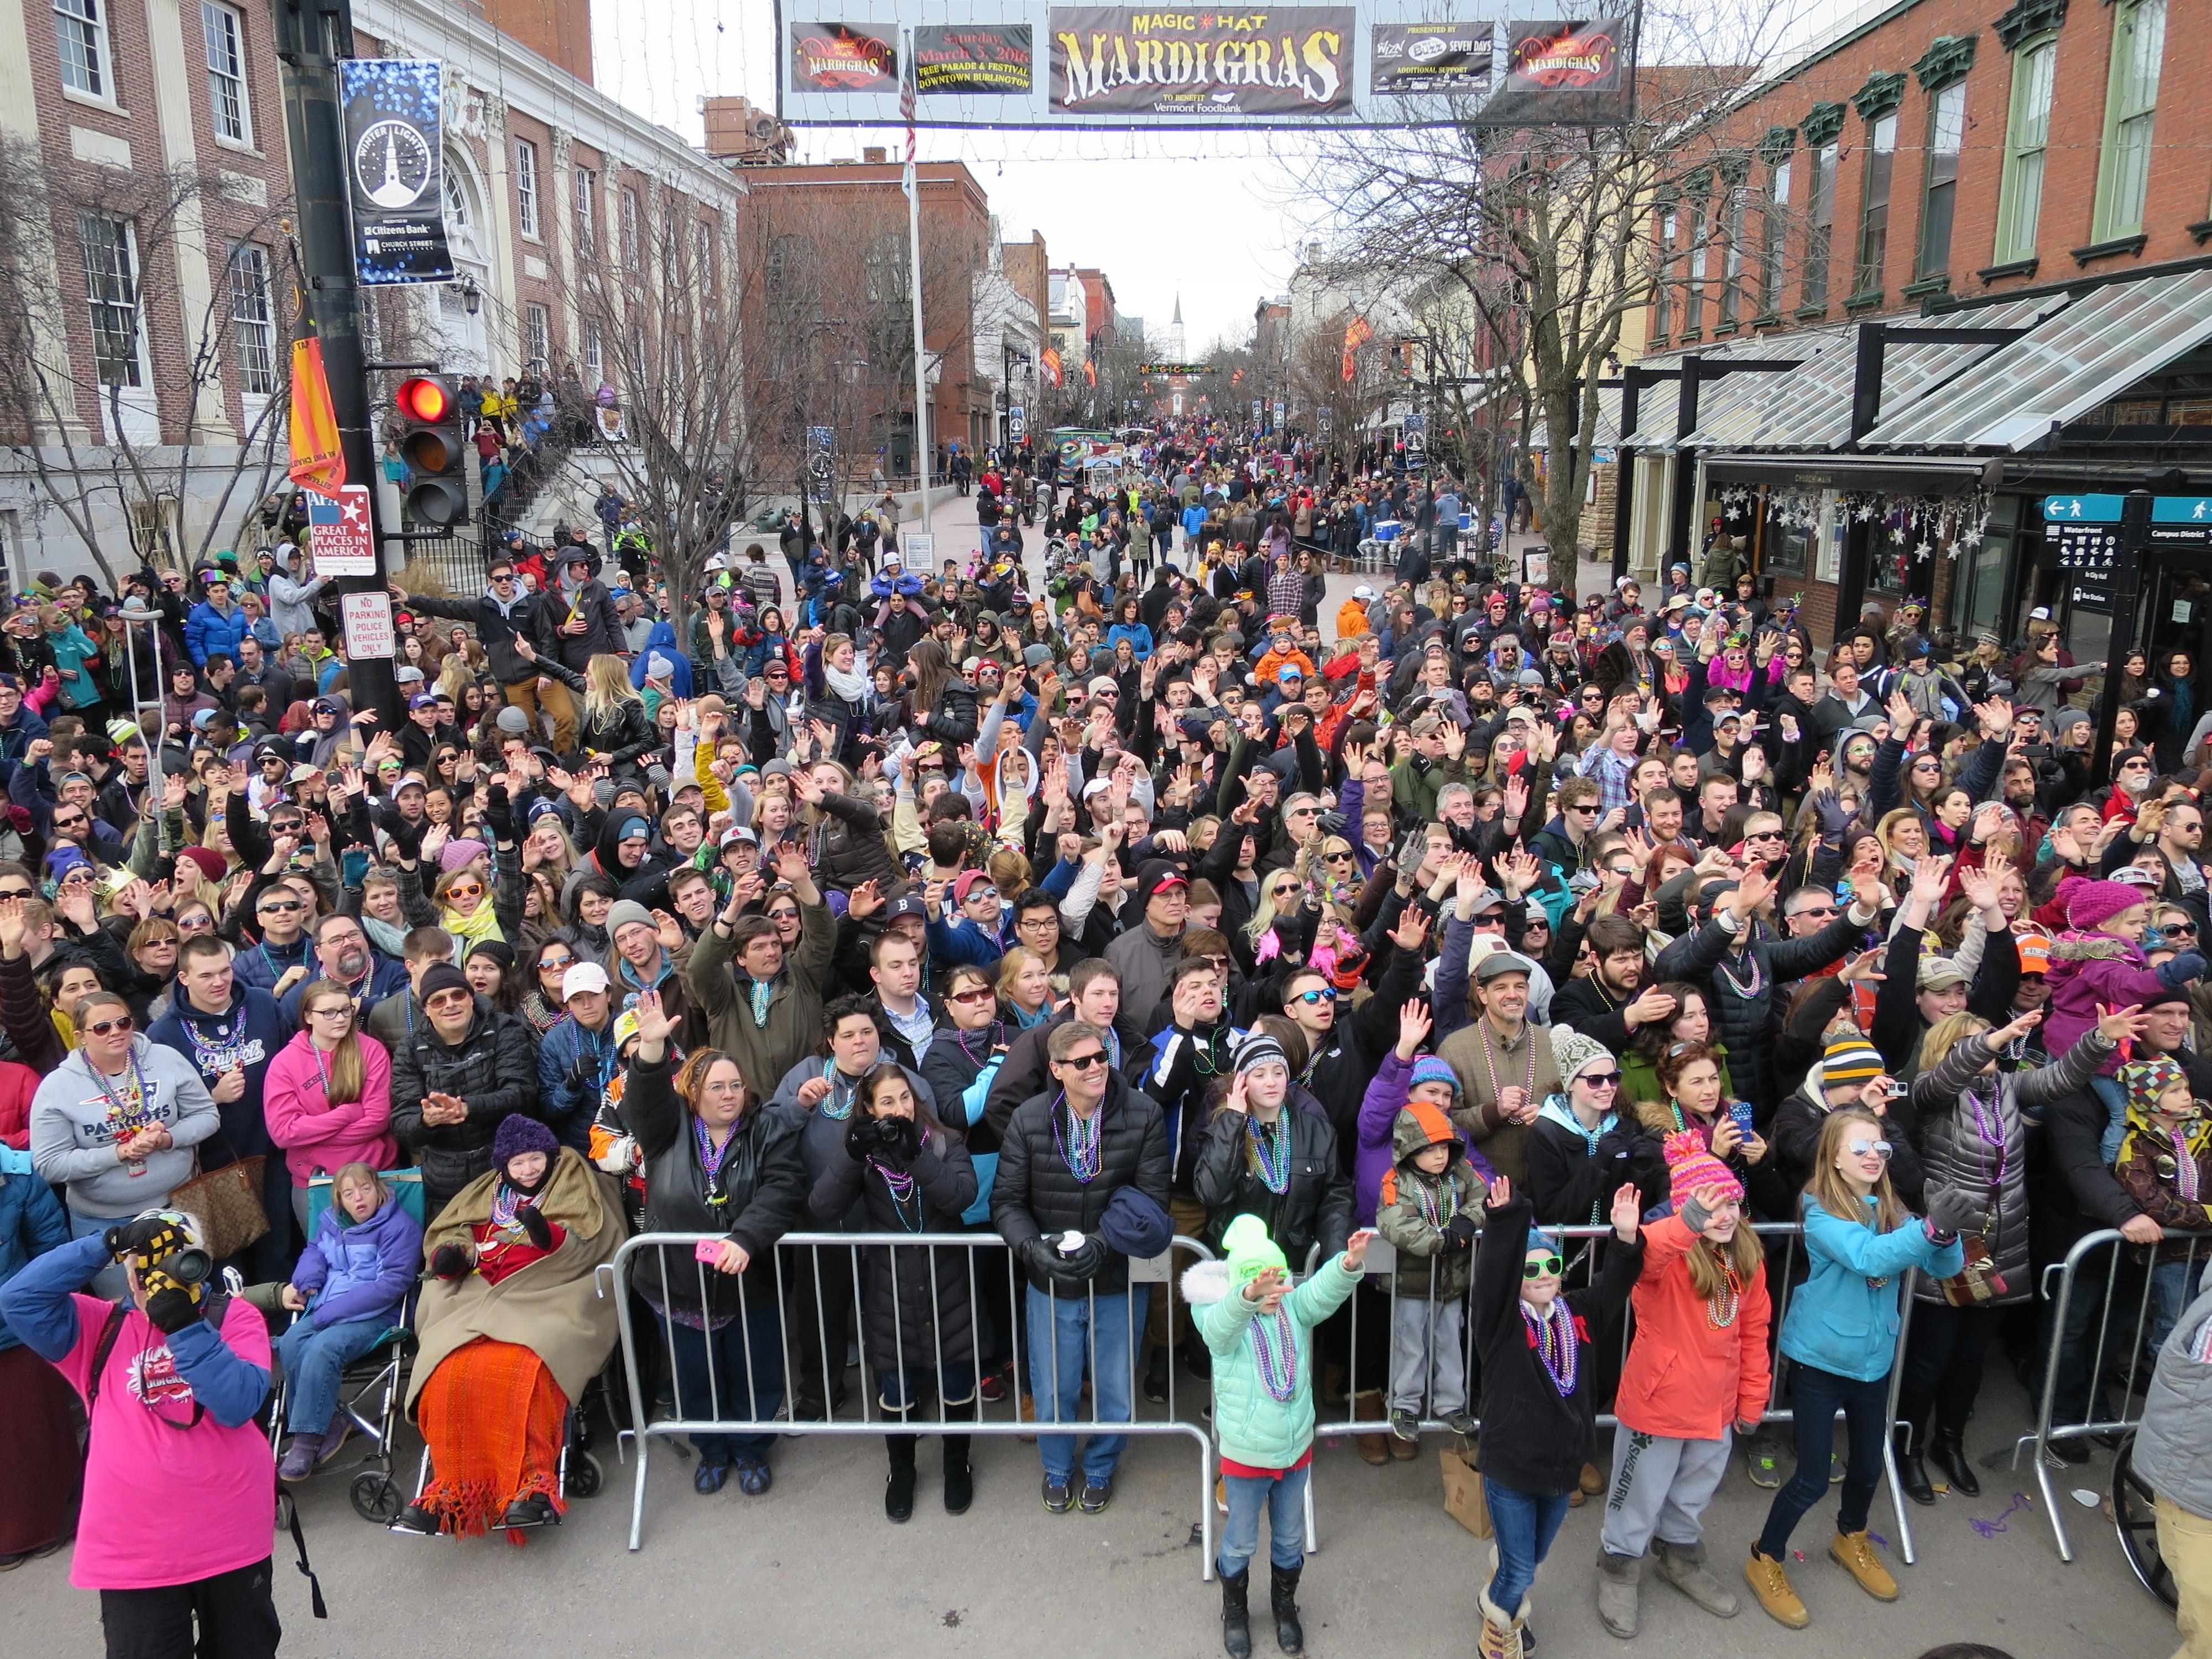 Magic Hat Cancels Mardi Gras Parade Relocates Festivities To